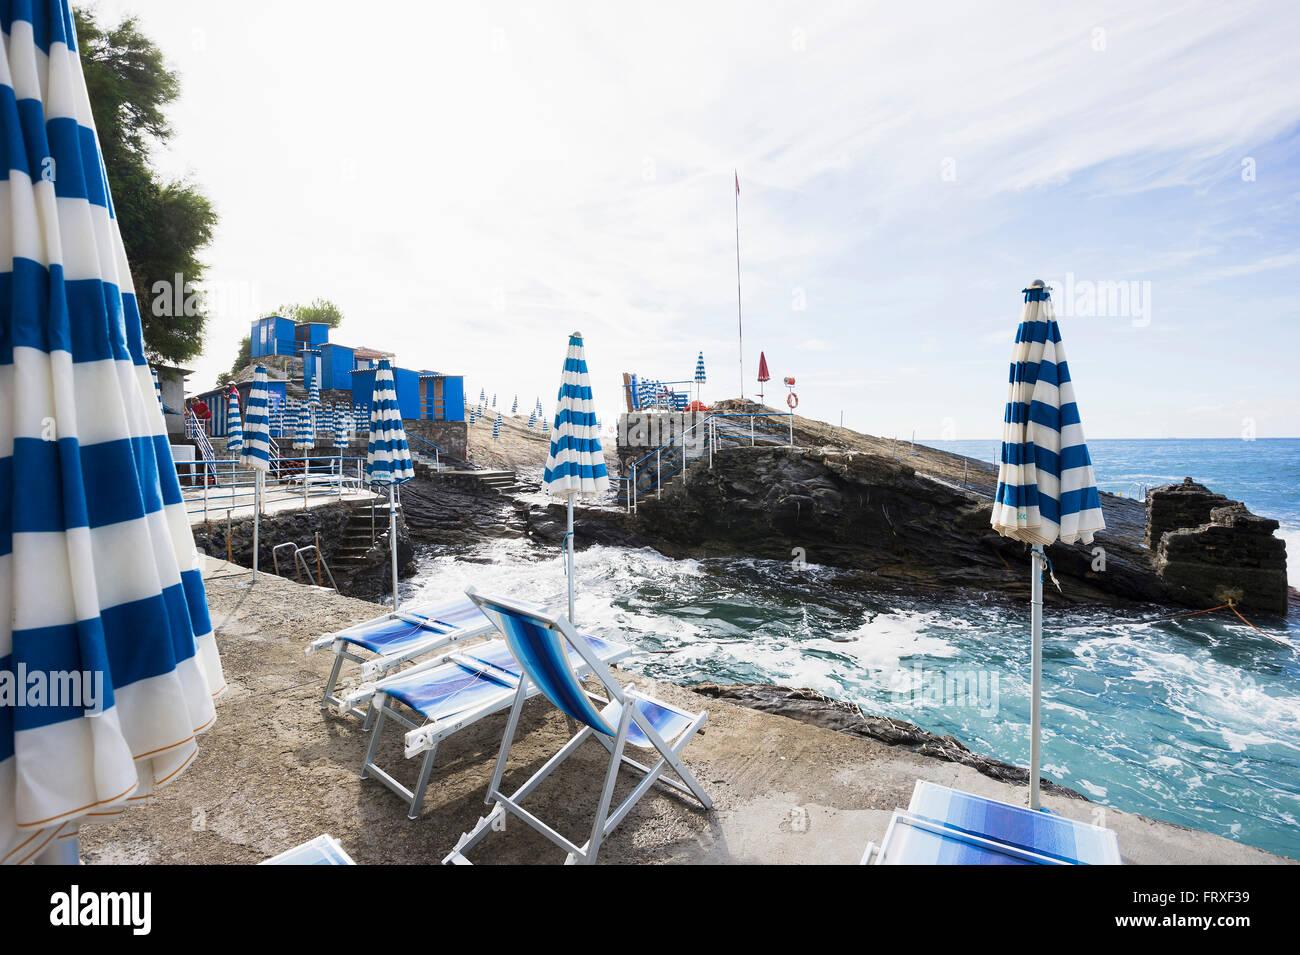 Bagni scogliera nervi genoa liguria italia stock photo